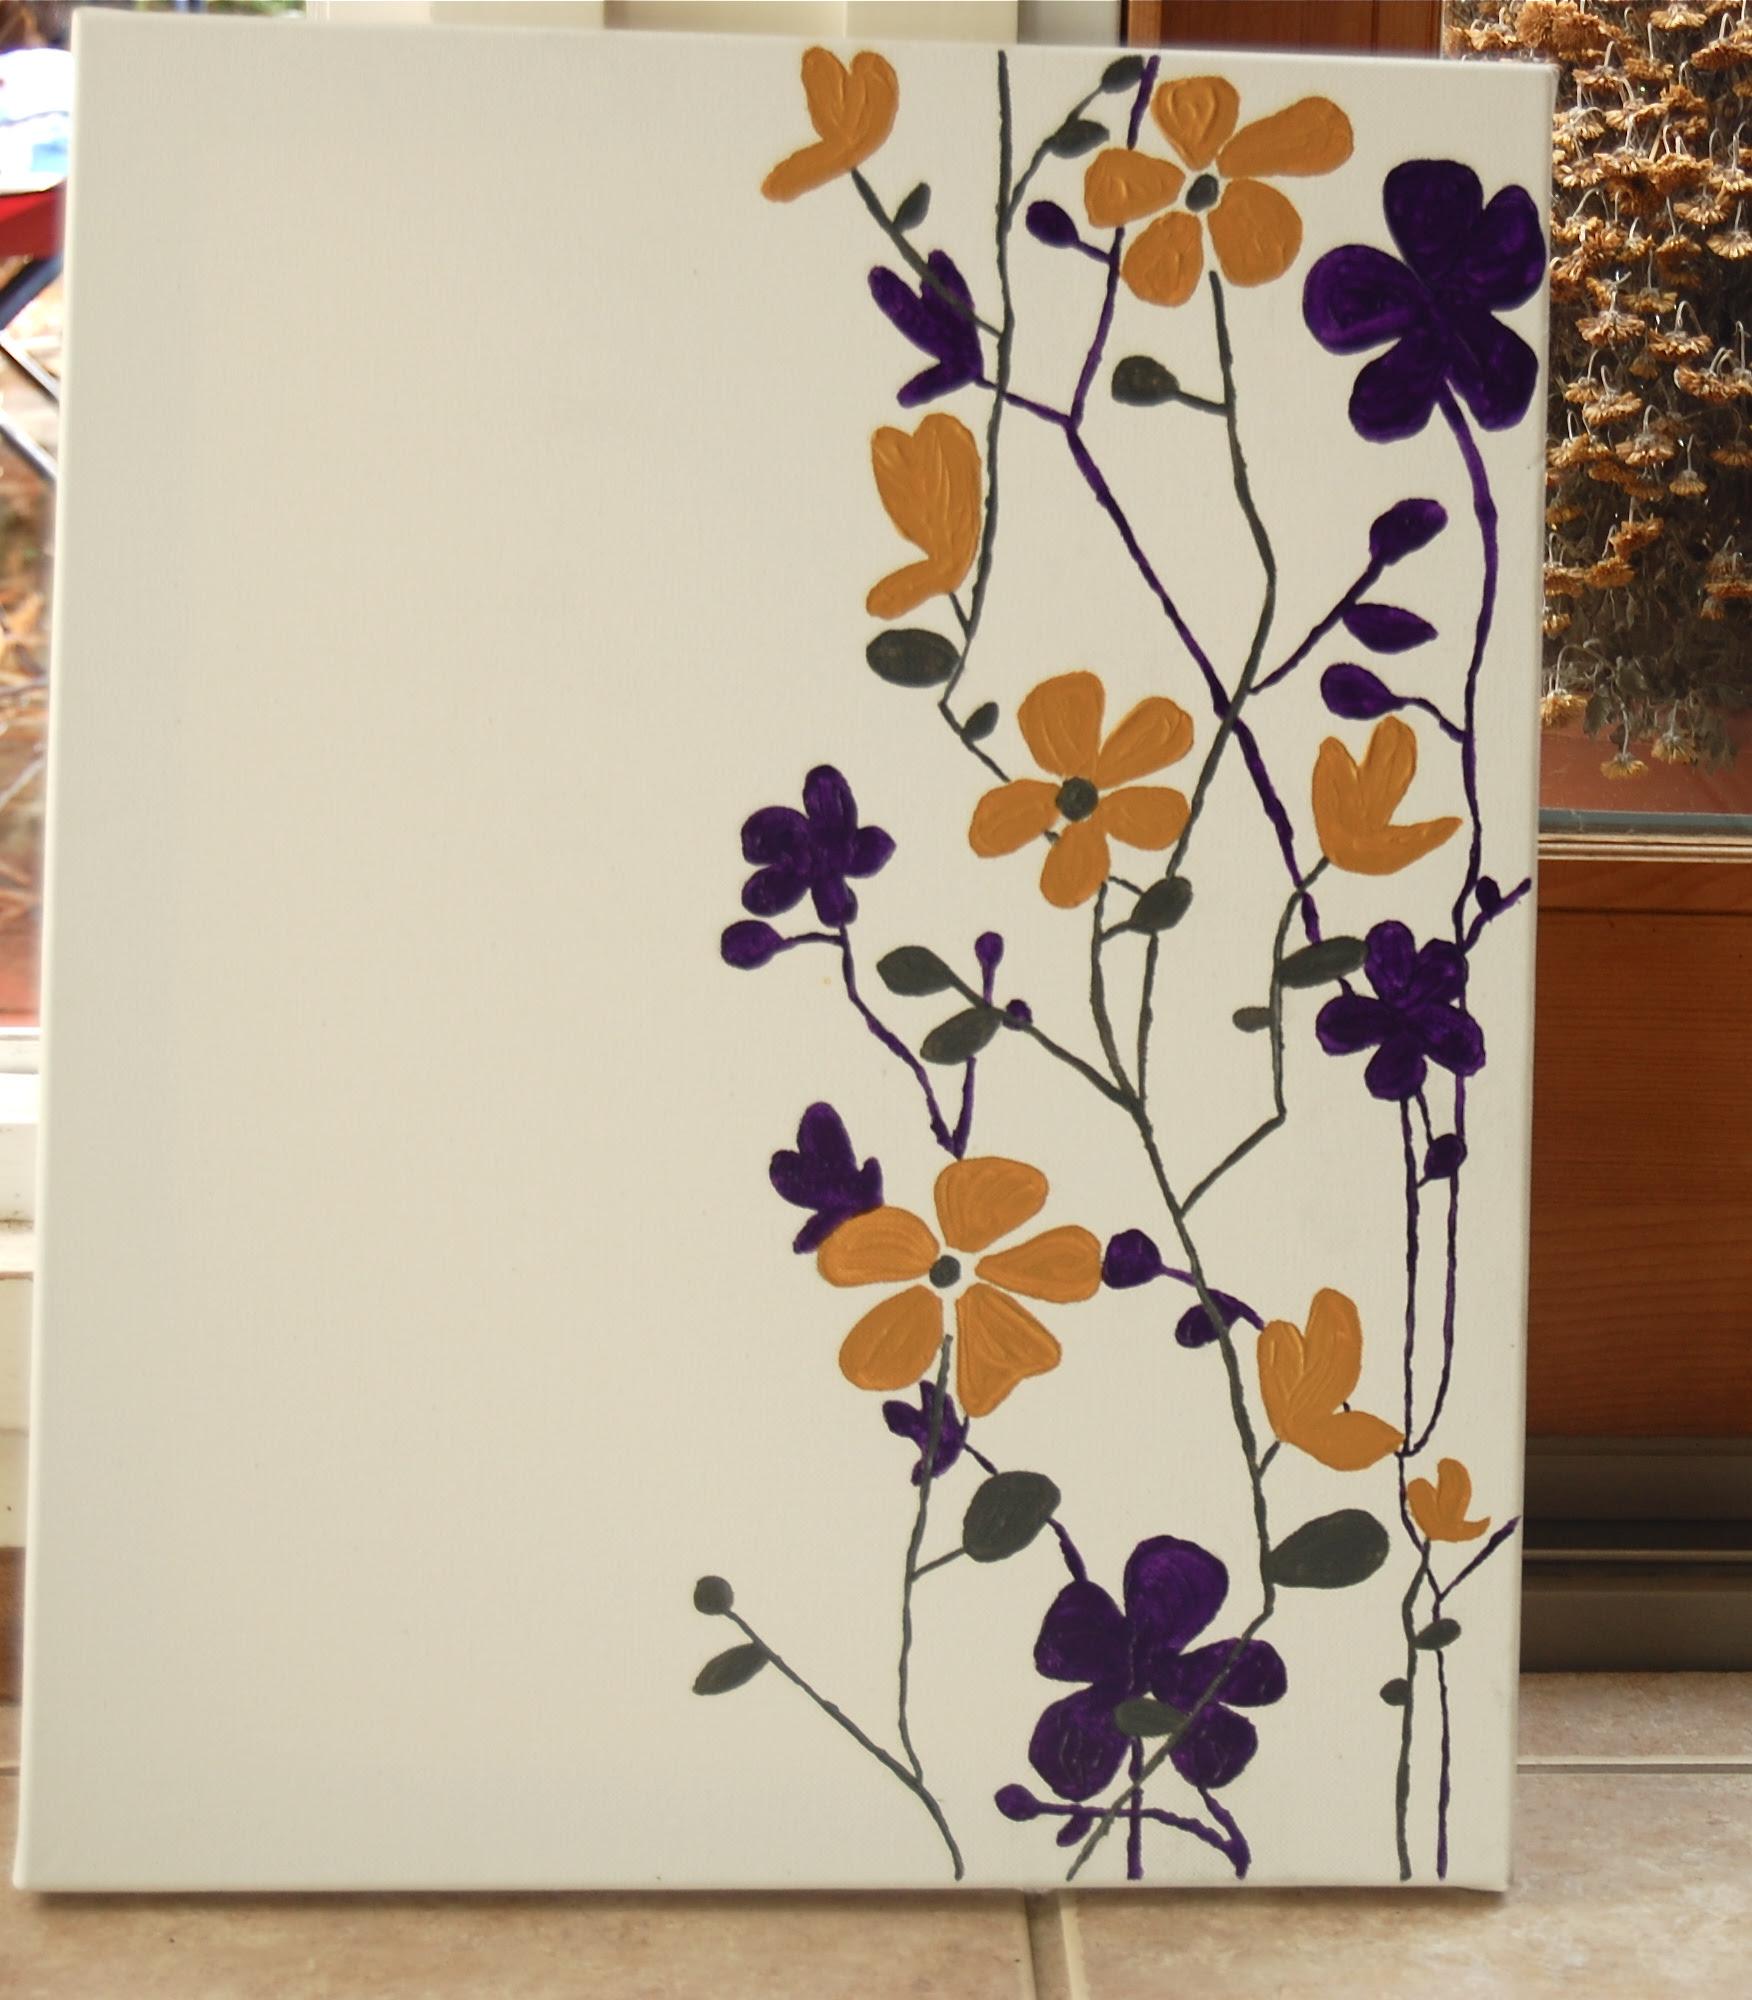 Inspirational Living Room Ideas Living Room Design Diy Canvas Painting Ideas For Living Room